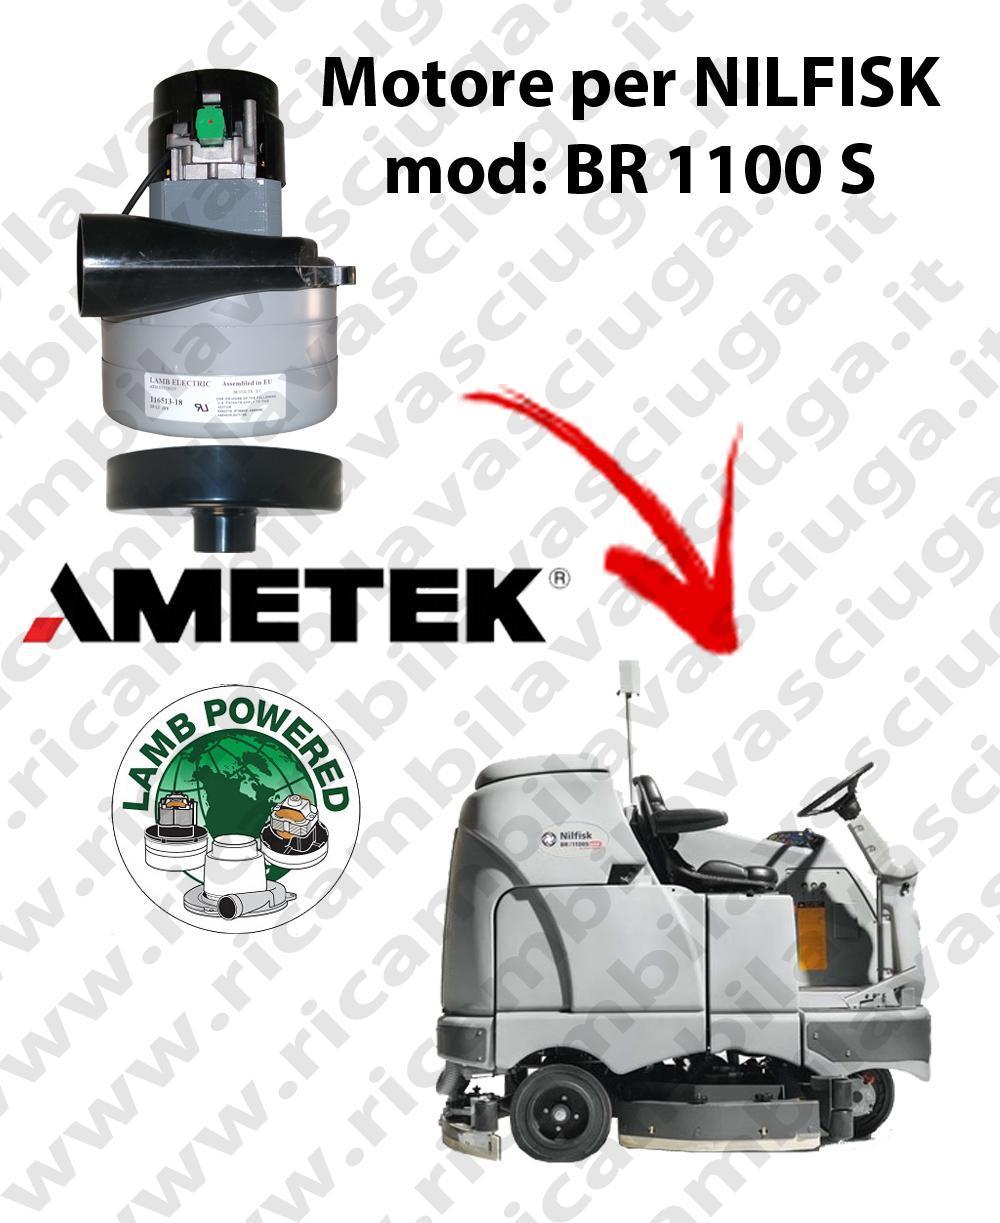 BR 1100 S Vacuum motor LAMB AMETEK for scrubber dryer NILFISK